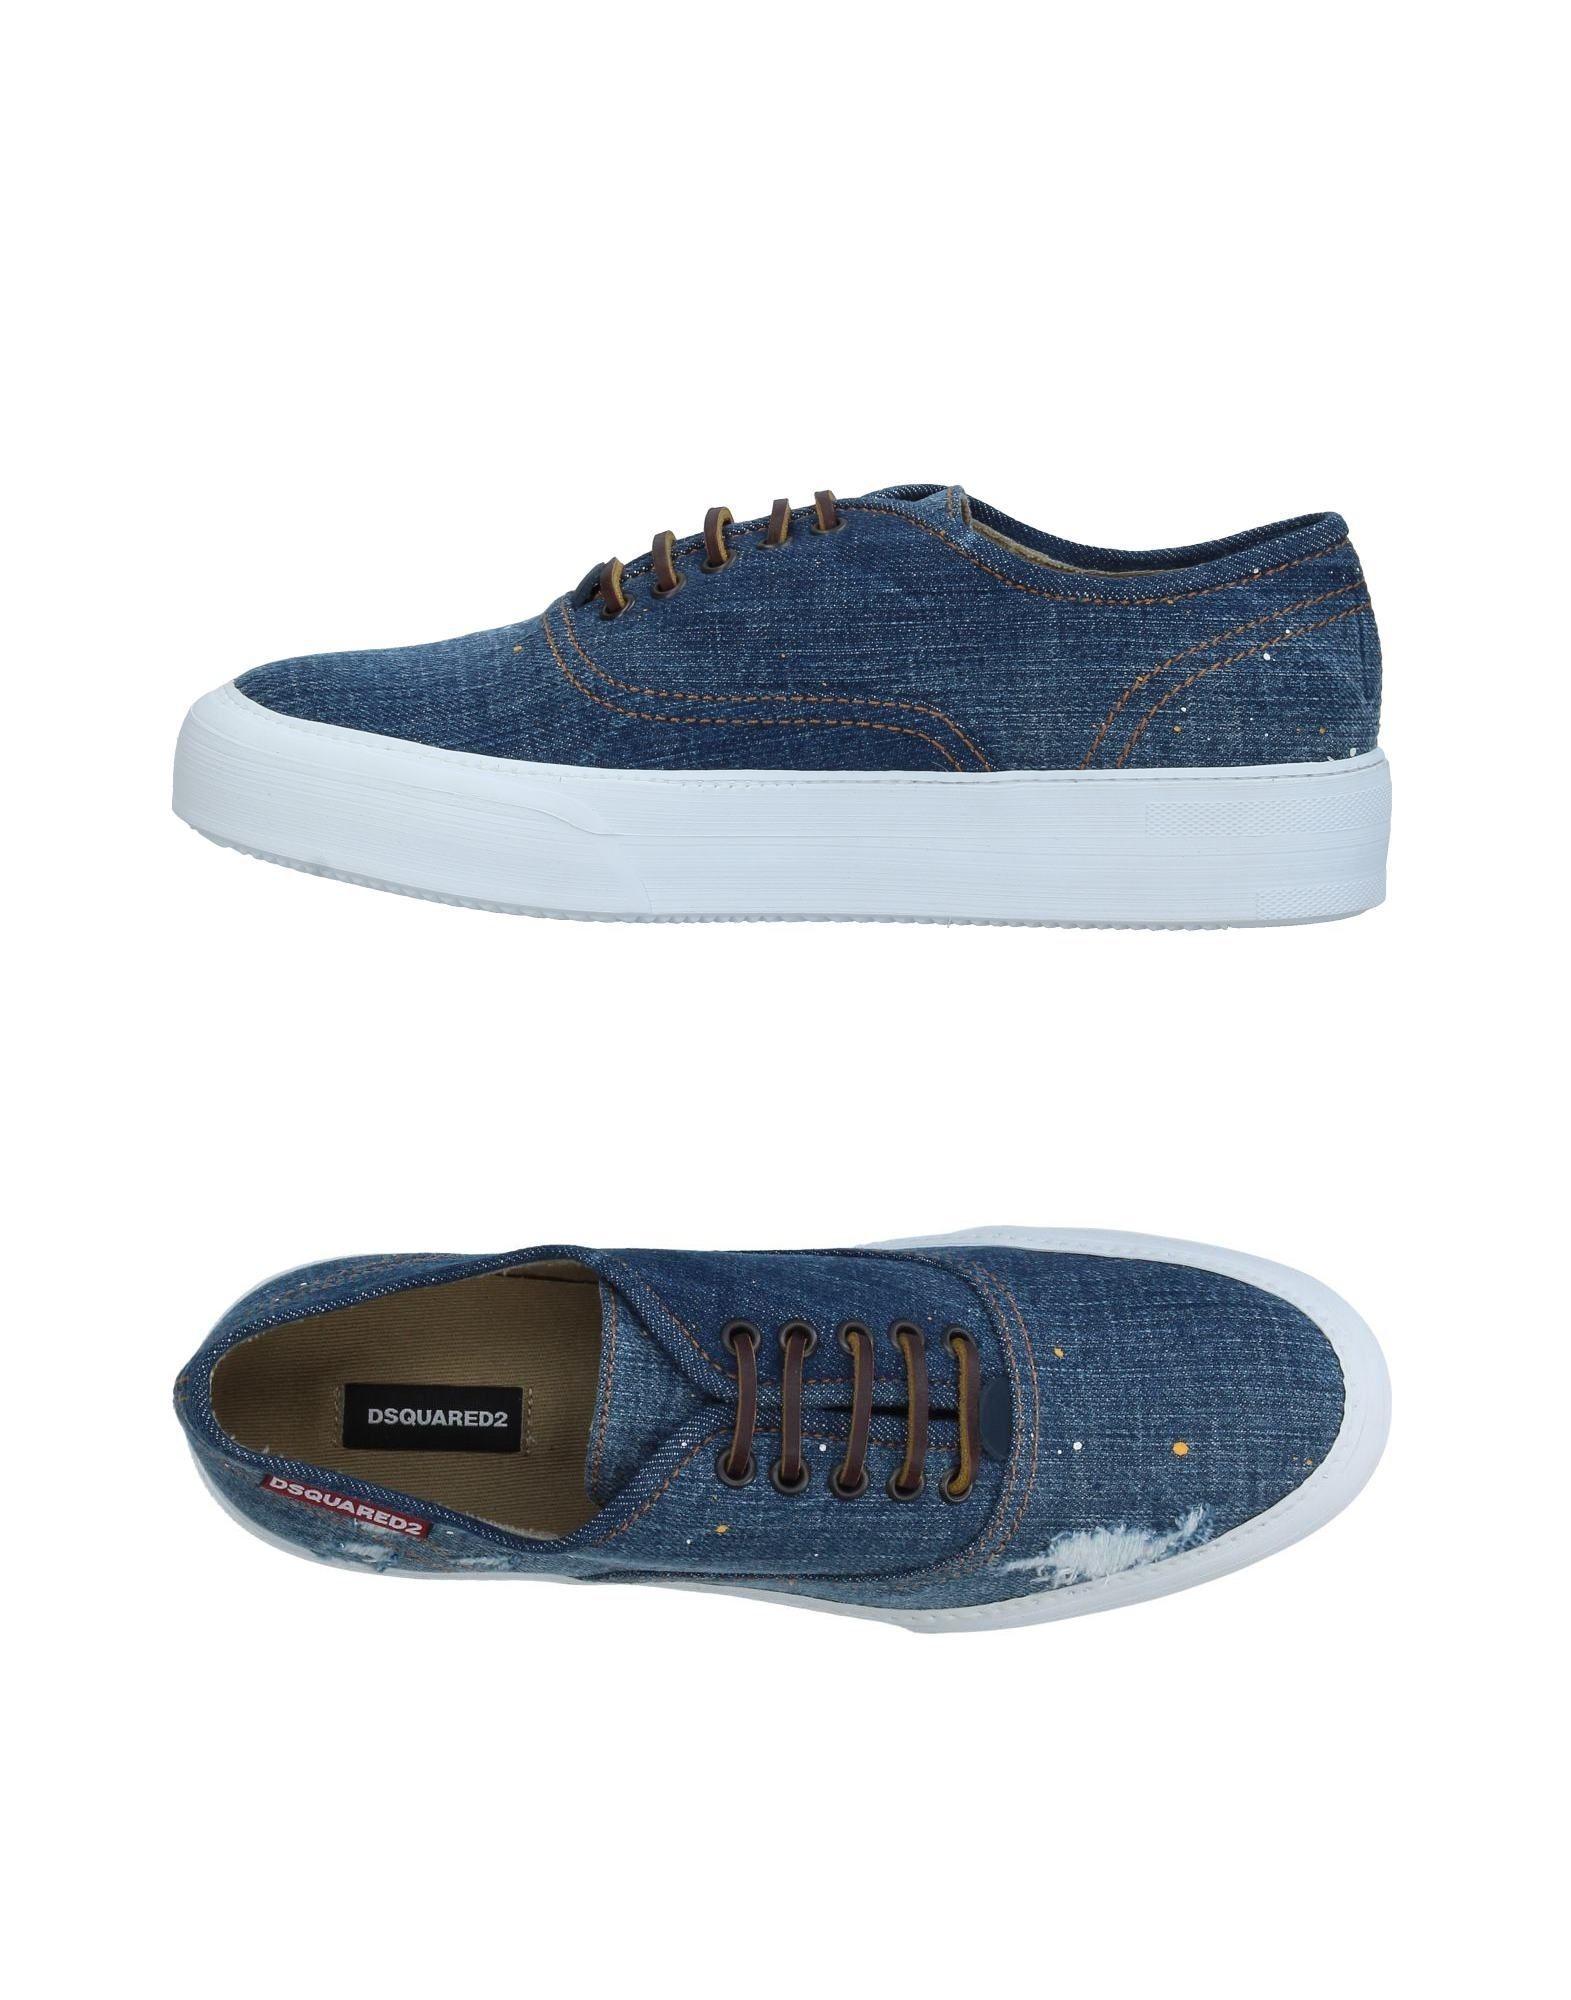 Dsquared2 Sneakers - Men  Dsquared2 Sneakers online on  Men Australia - 11357032JM 013d32